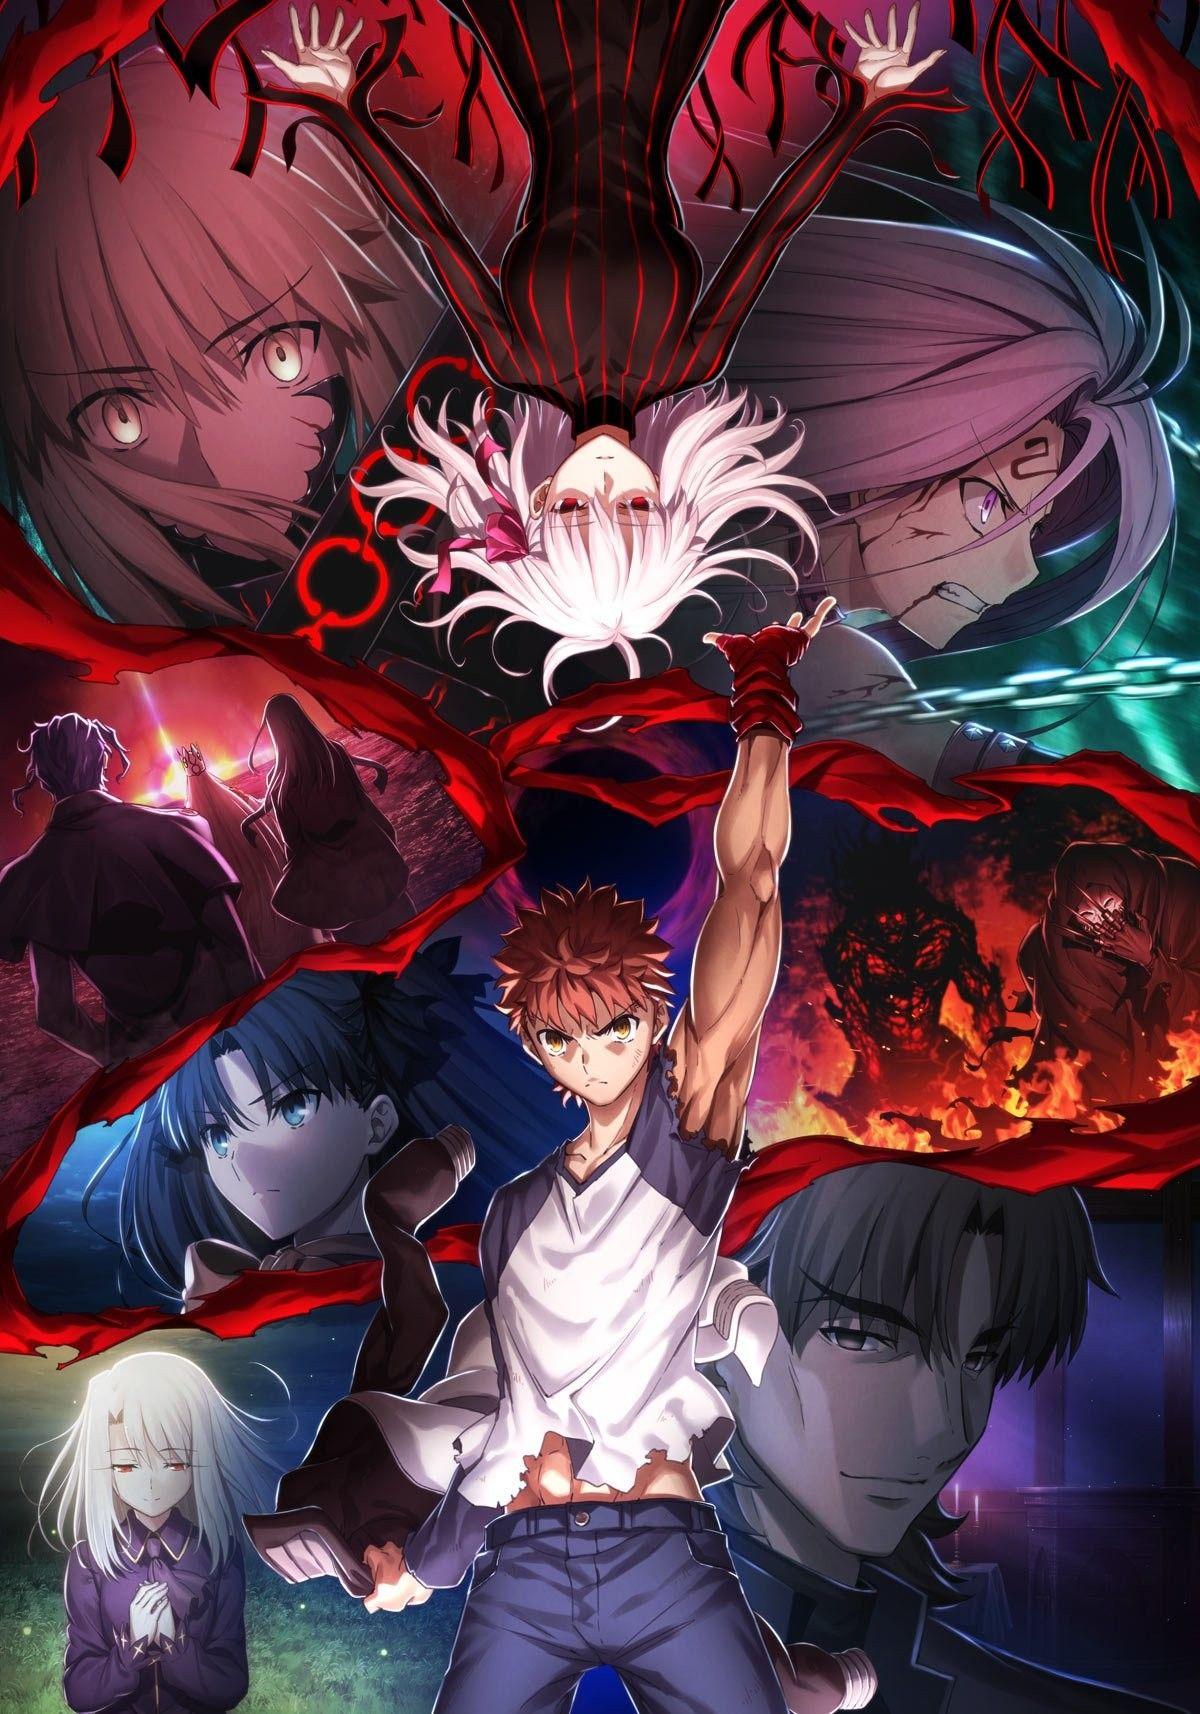 Fate heaven's feel III Film d'animation, Fate stay night